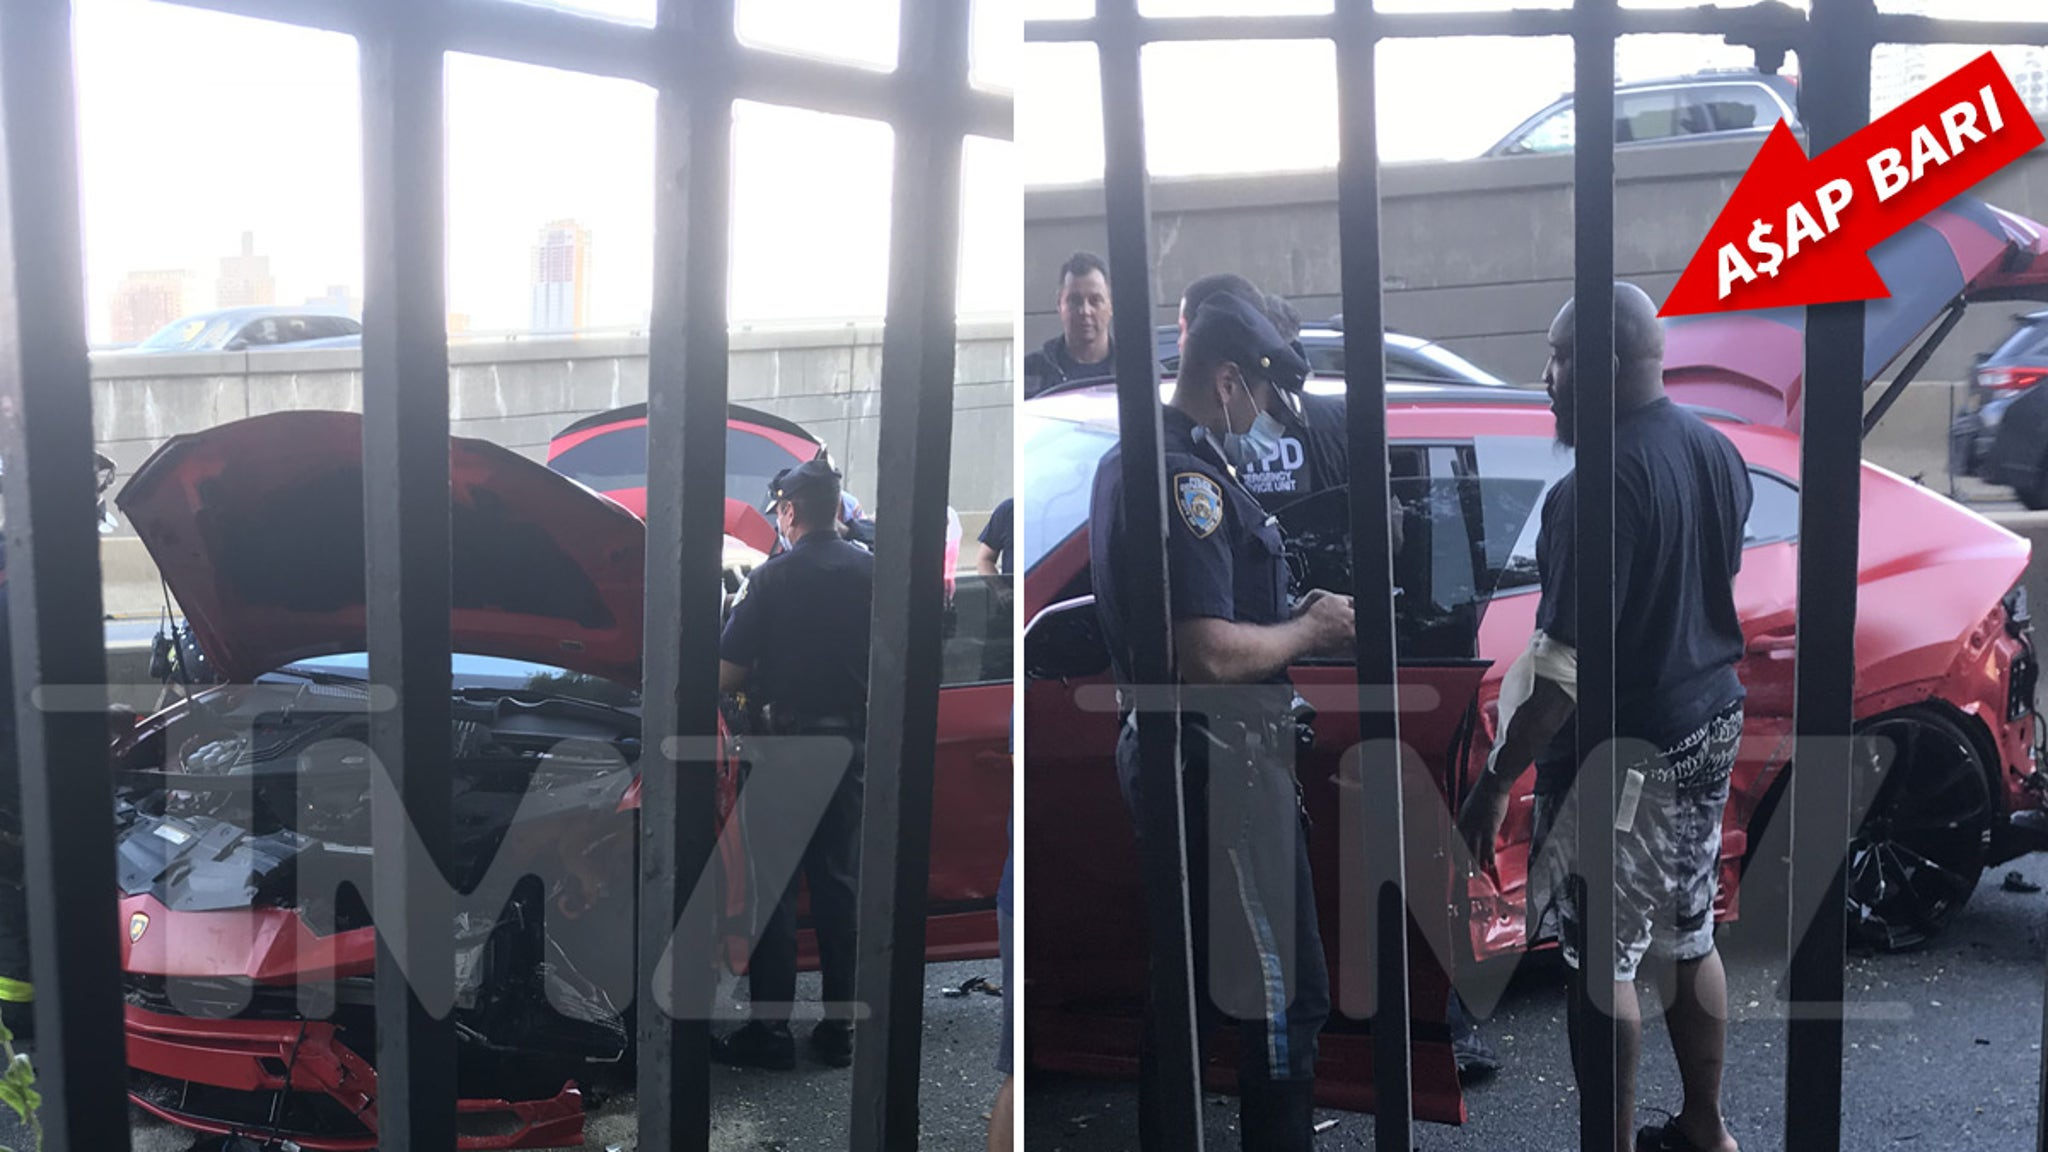 A$AP Bari Involved in Lamborghini Wreck in NYC